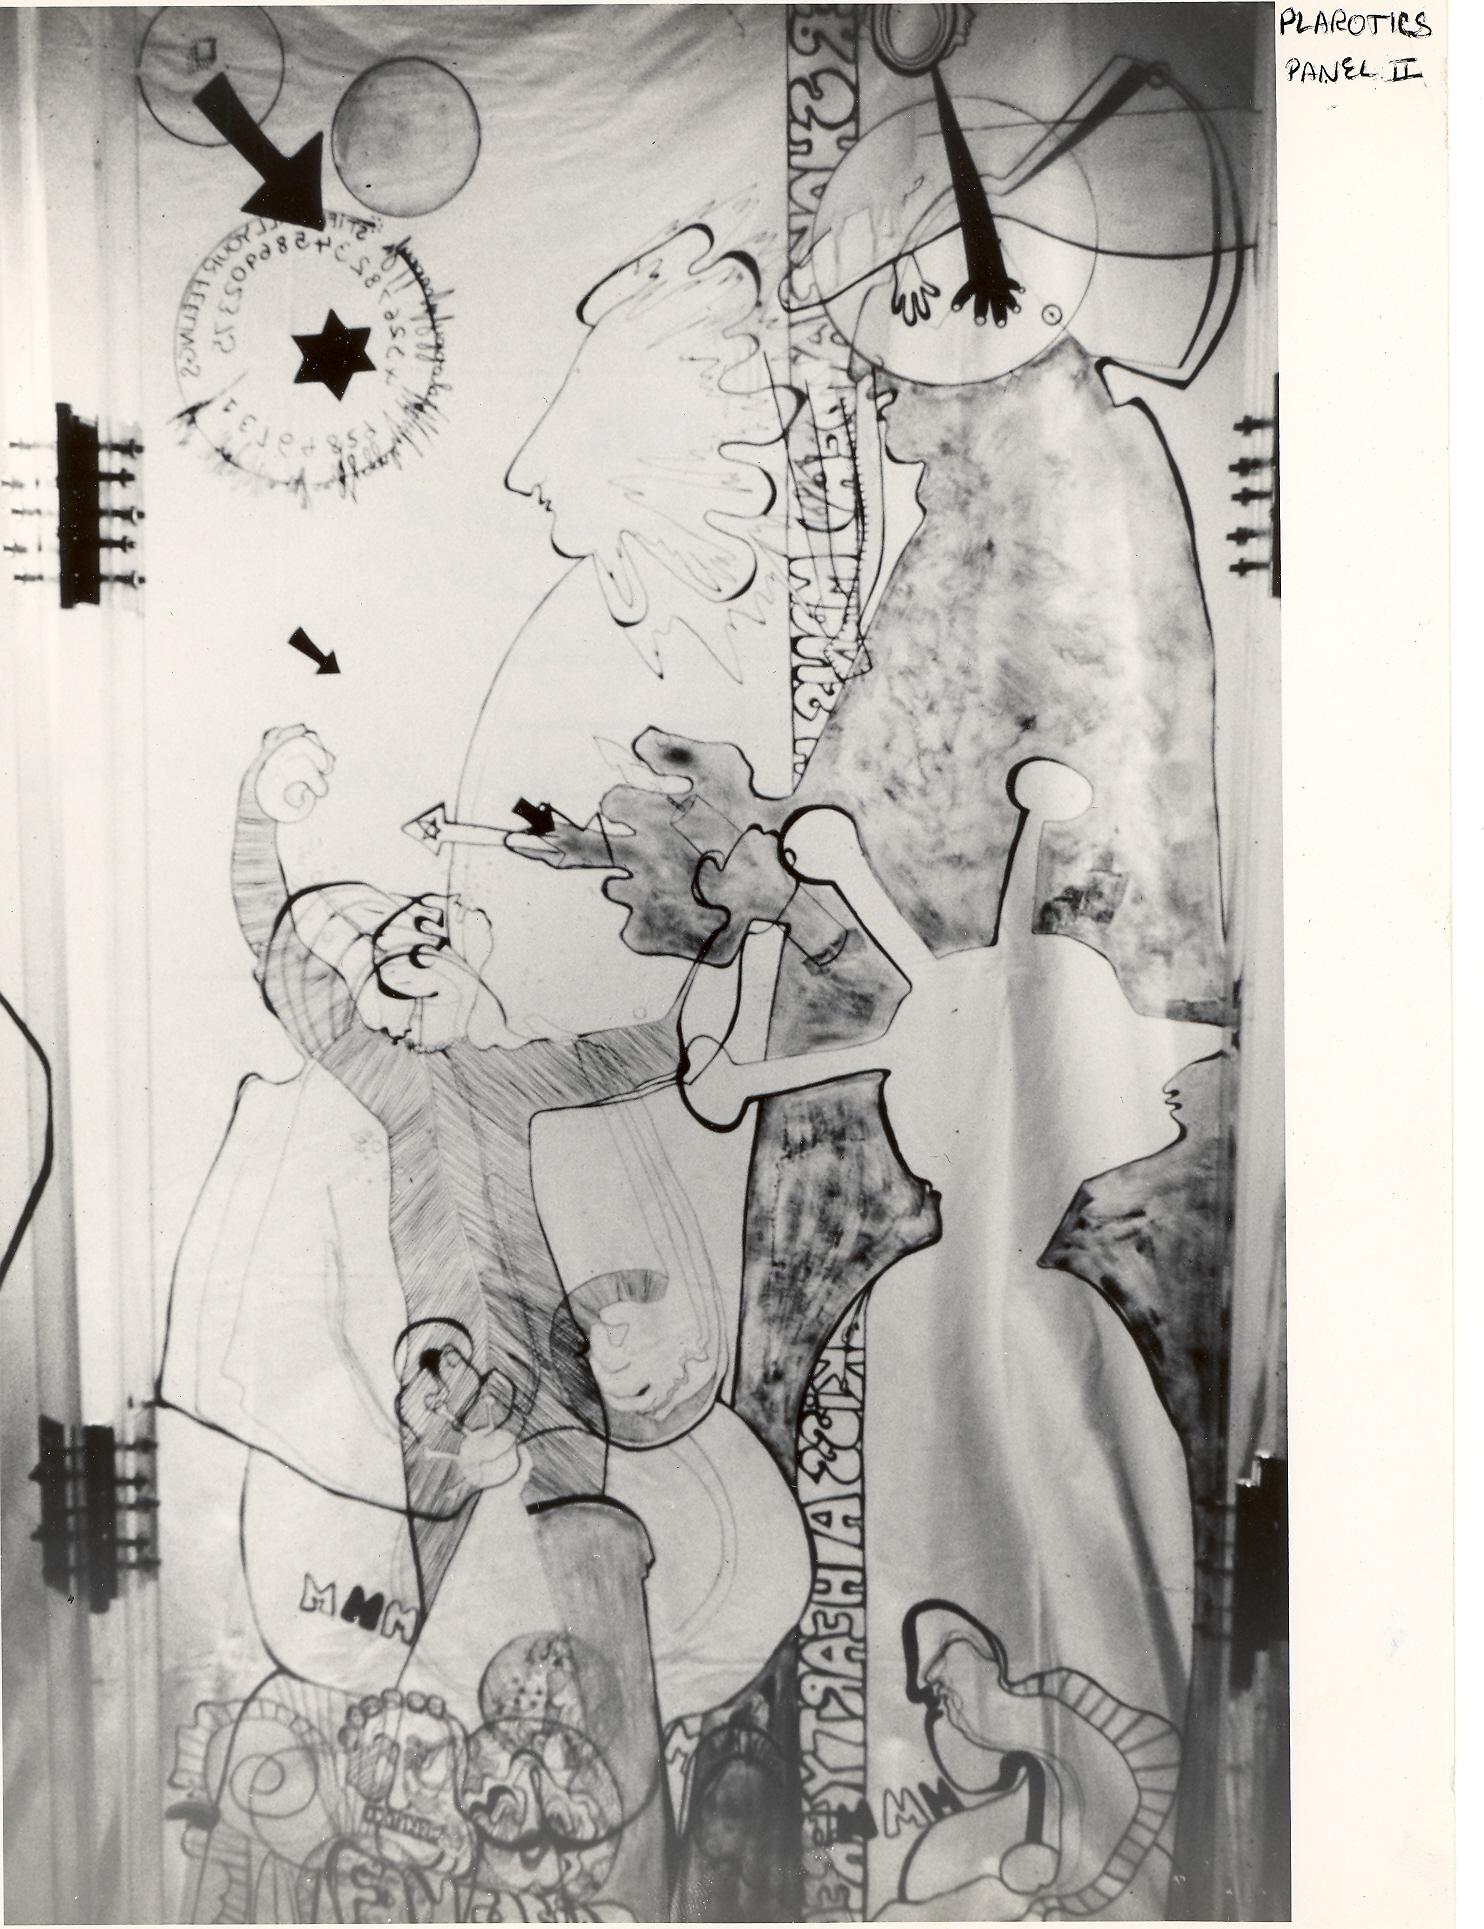 Plarotics - Panel II - Never Kiss a Dead Man's Hand.jpg